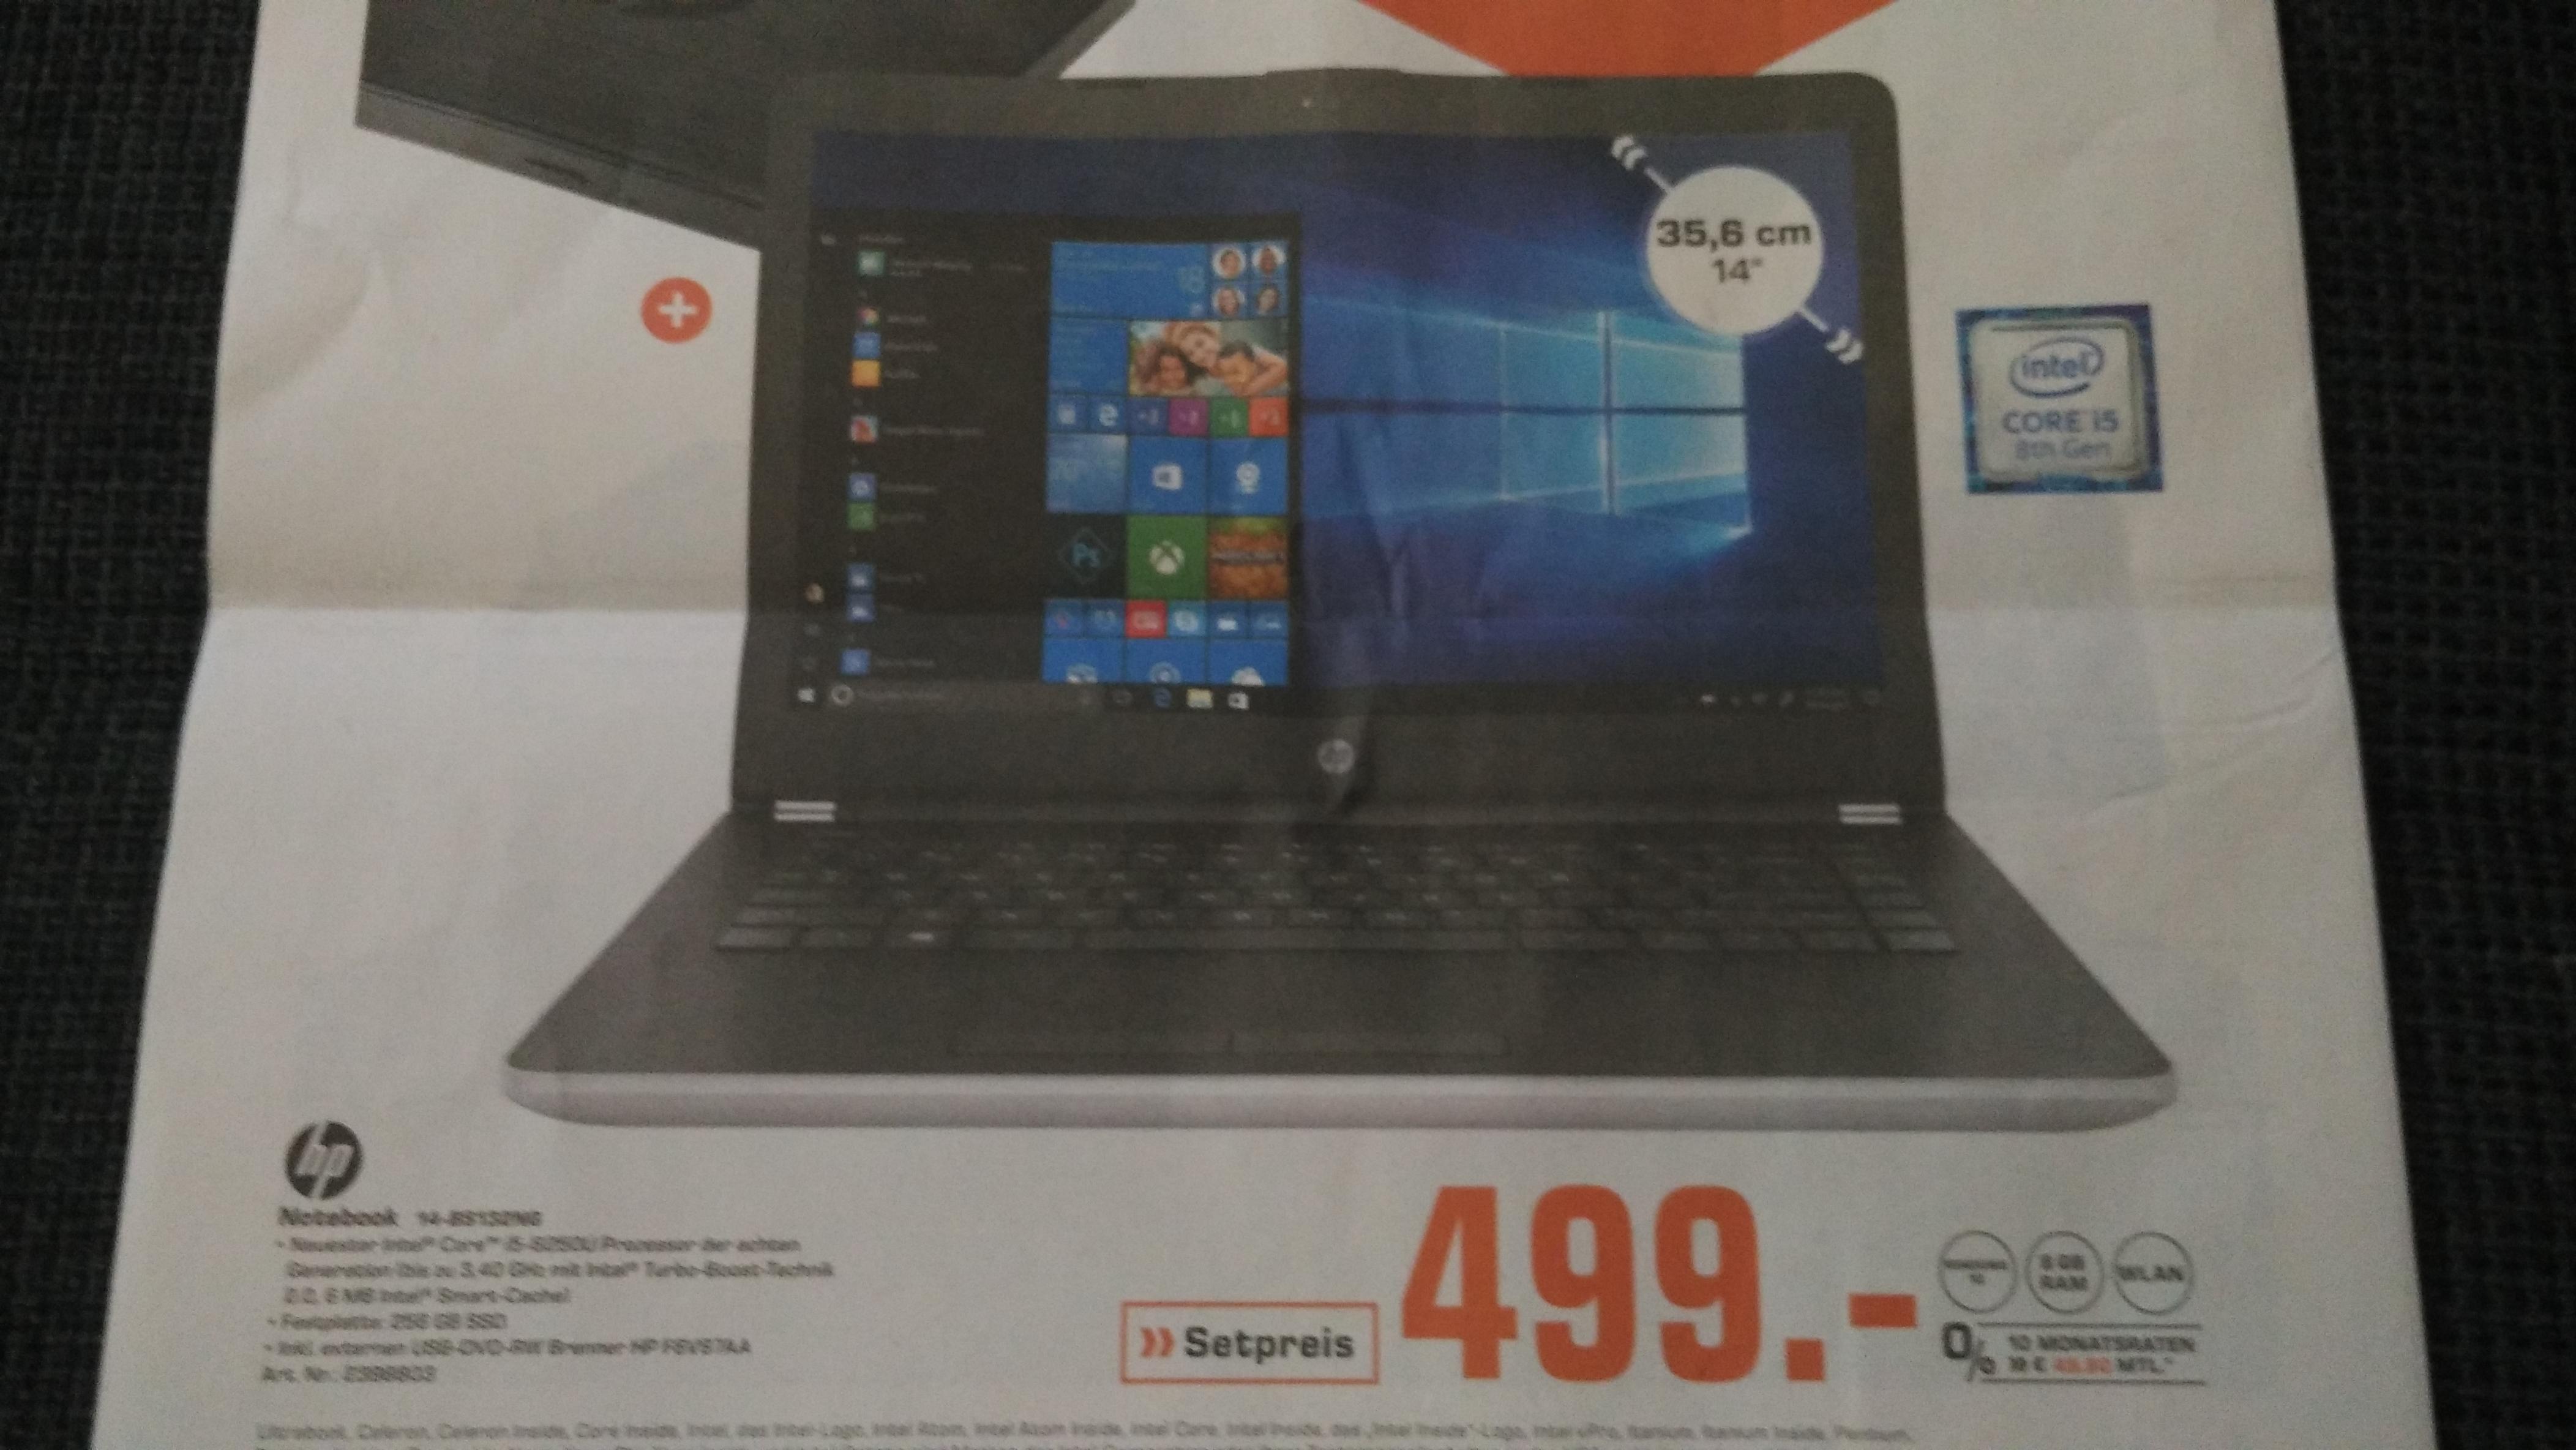 "[Lokal München - Saturn] HP 14-bs132ng - 14"" Full HD Notebook (i5-8250U, 8 GB RAM, 256 GB SSD, IPS, Windows 10 Home, 1.70kg)  + Externer DVD Brenner HP F6V97AA"